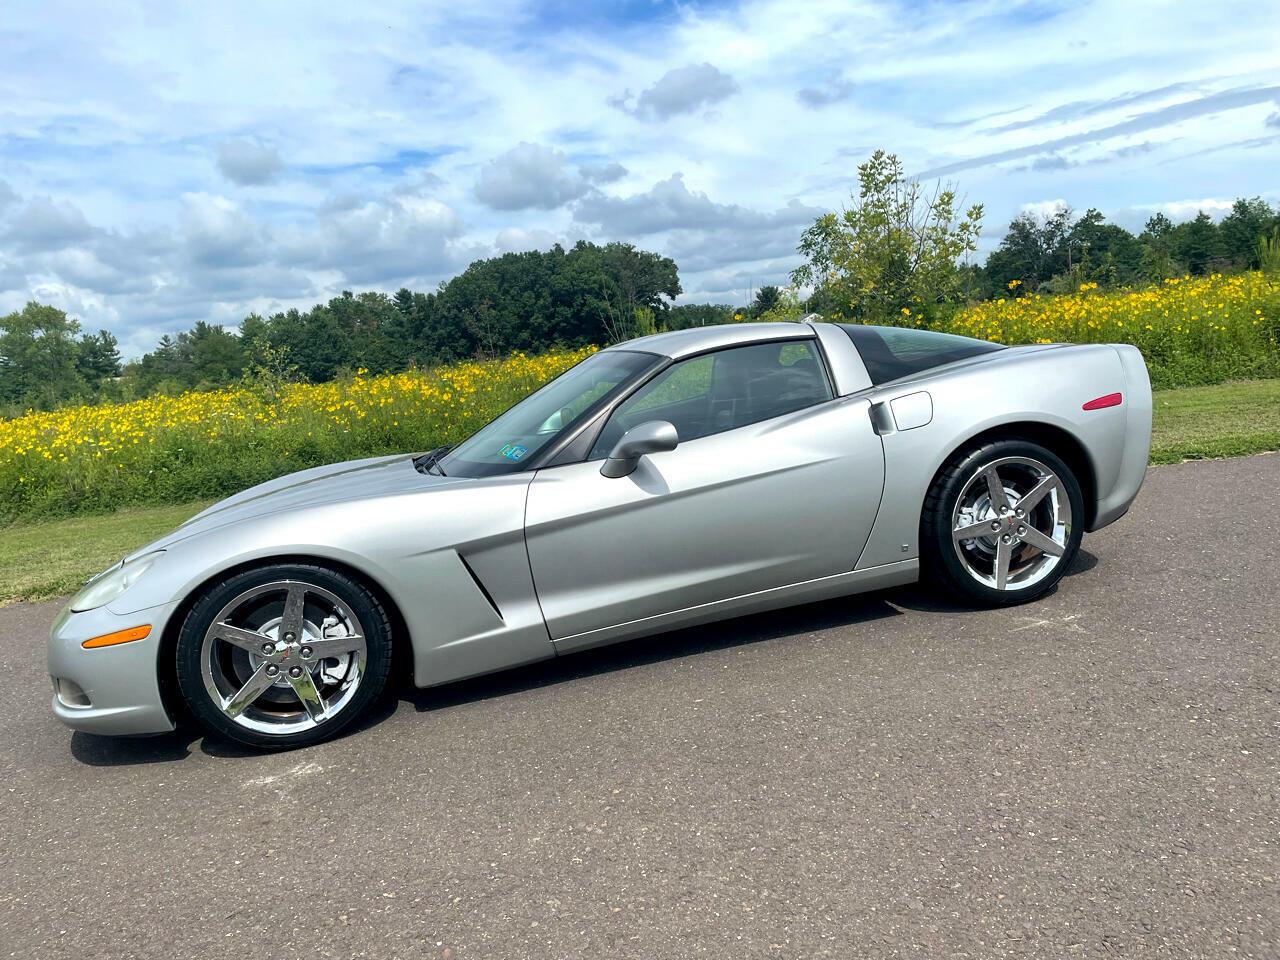 2007 Silver Chevrolet Corvette   | C6 Corvette Photo 2